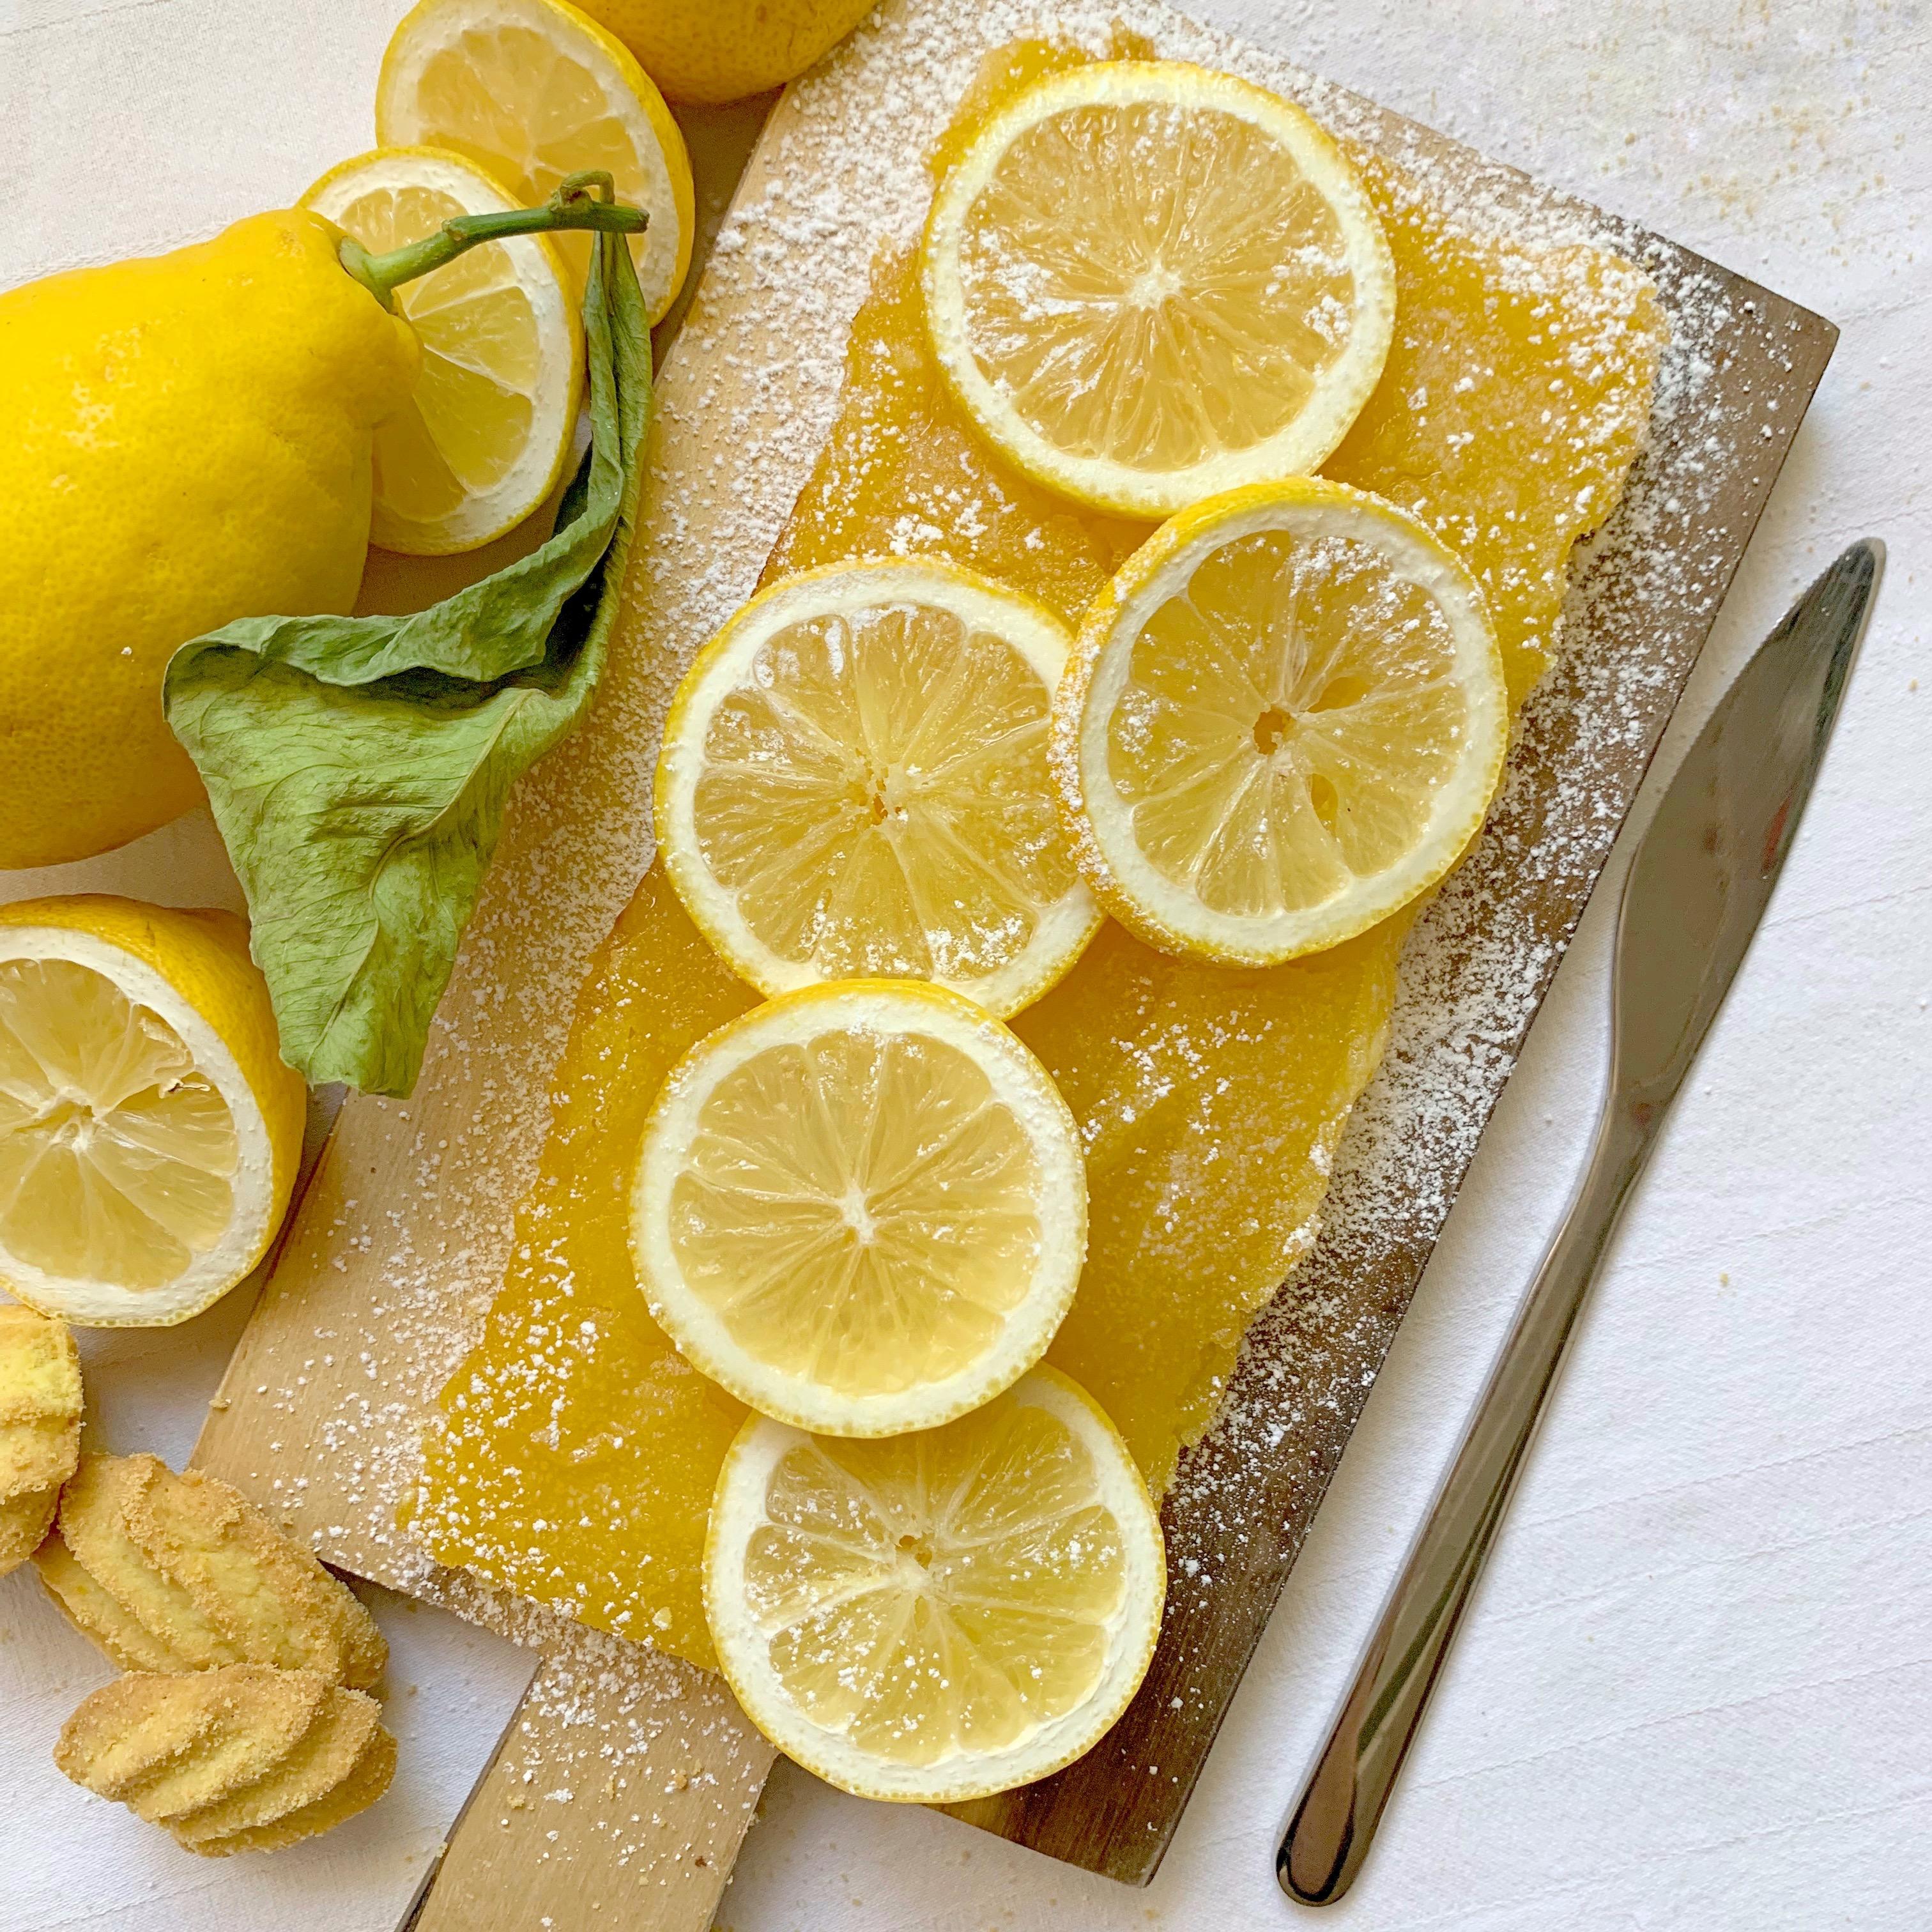 Lemon Bars Senza Burro, i dolcetti inglesi in versione light di dolci senza burro